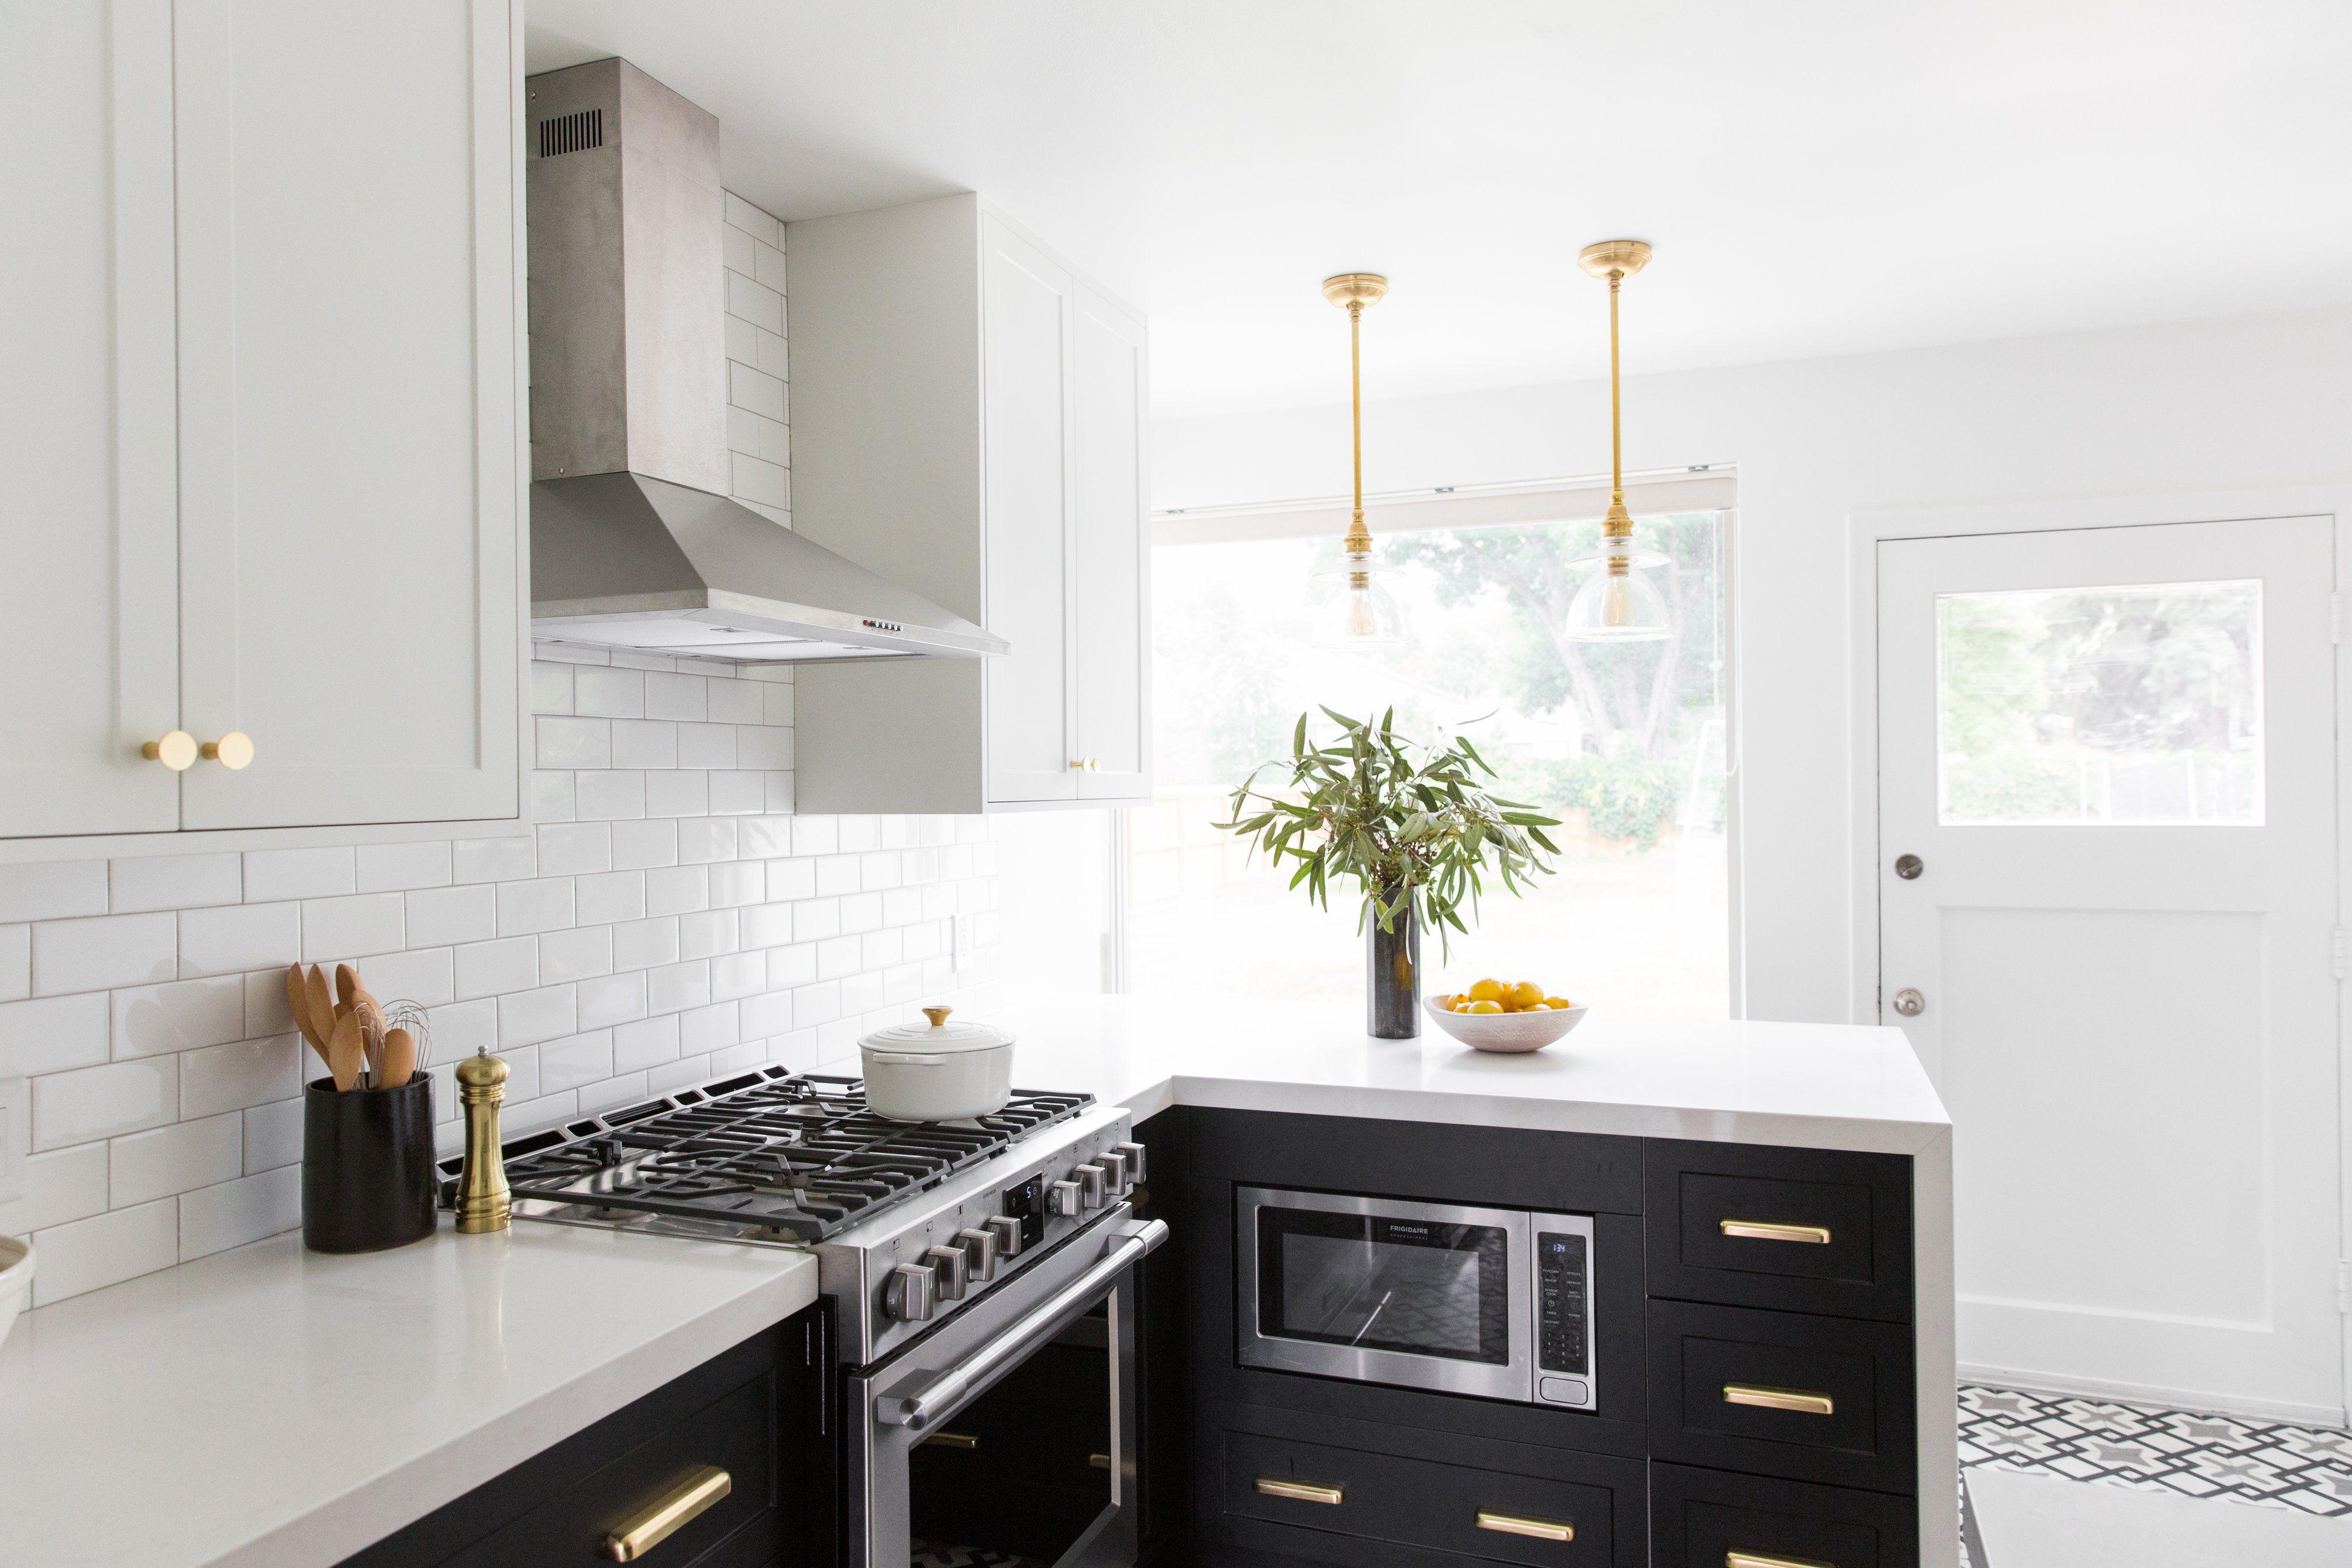 High Contrast Kitchen Remodel in Salt Lake City in 2020 ...